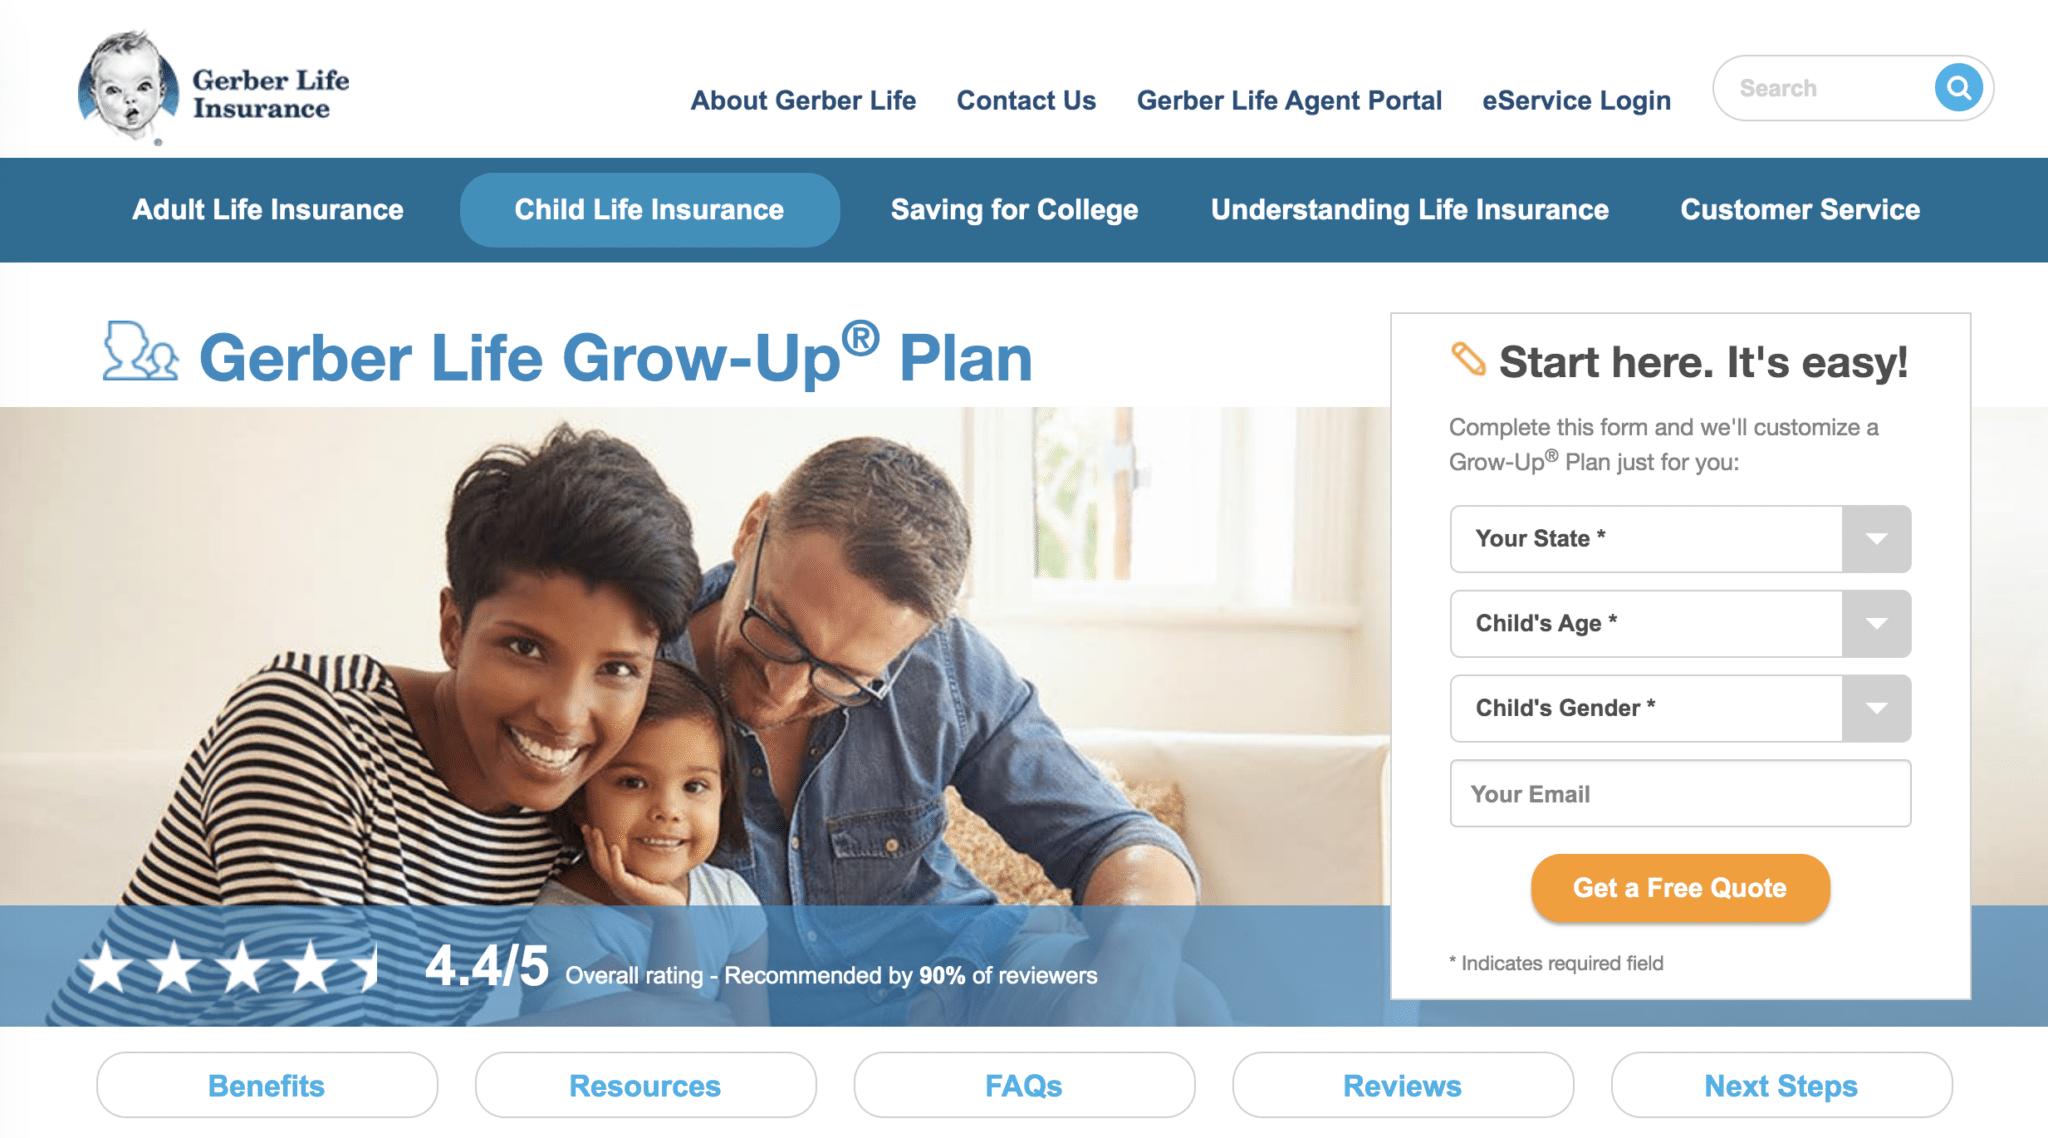 Gerber Life Insurance landing page